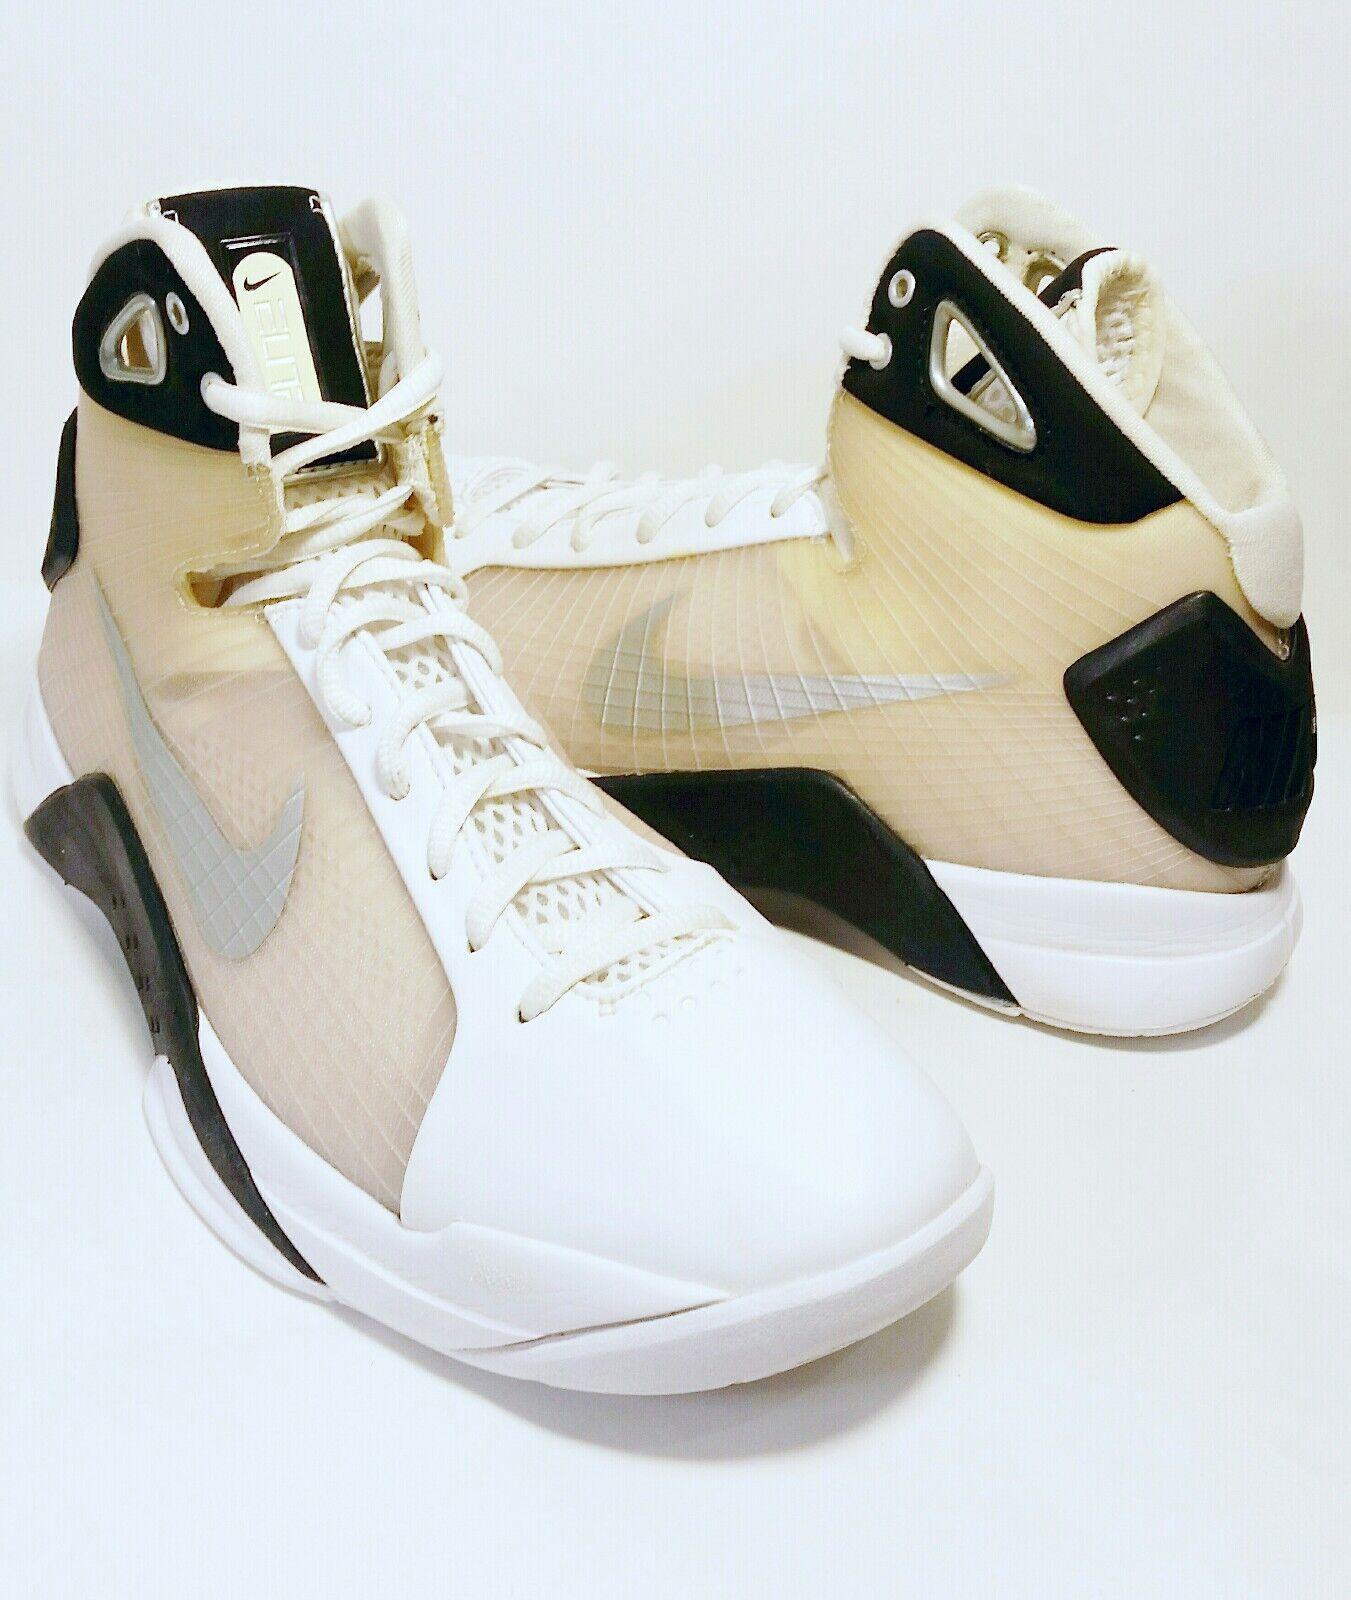 NIKE ELITE blanc /Clear/ Noir  Hommes Basketball Chaussures 324828-101